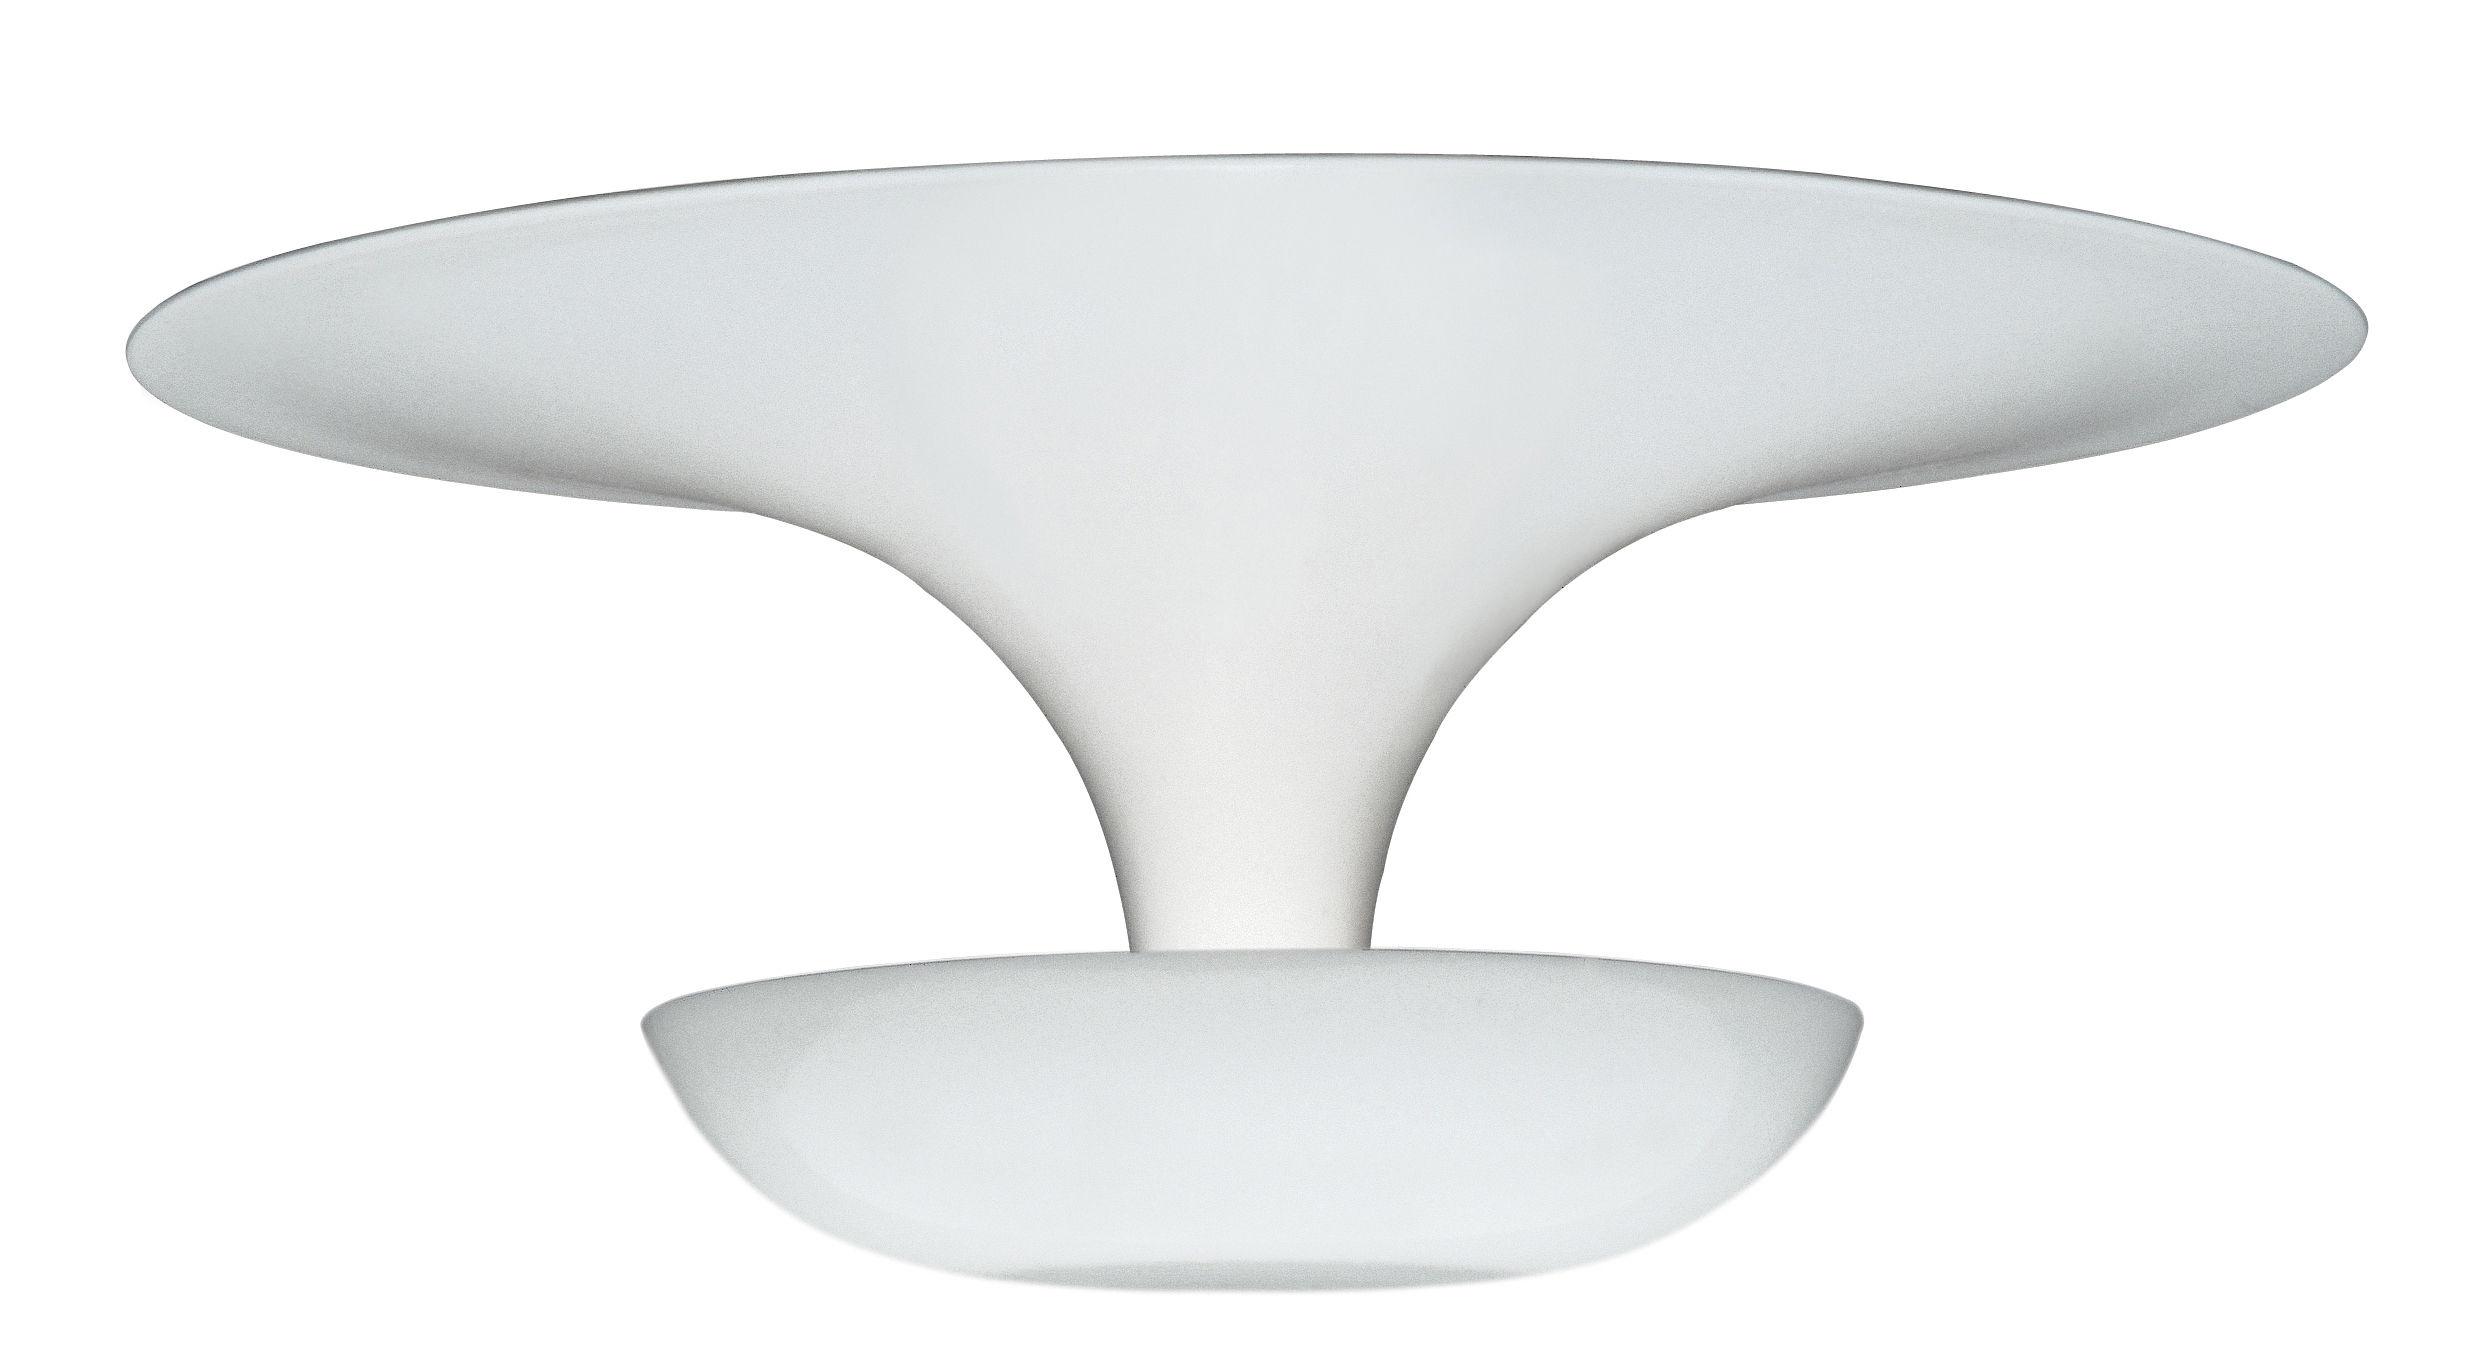 Luminaire - Plafonniers - Plafonnier Funnel Mini / Ø 22 cm - Vibia - Blanc - Aluminium peint